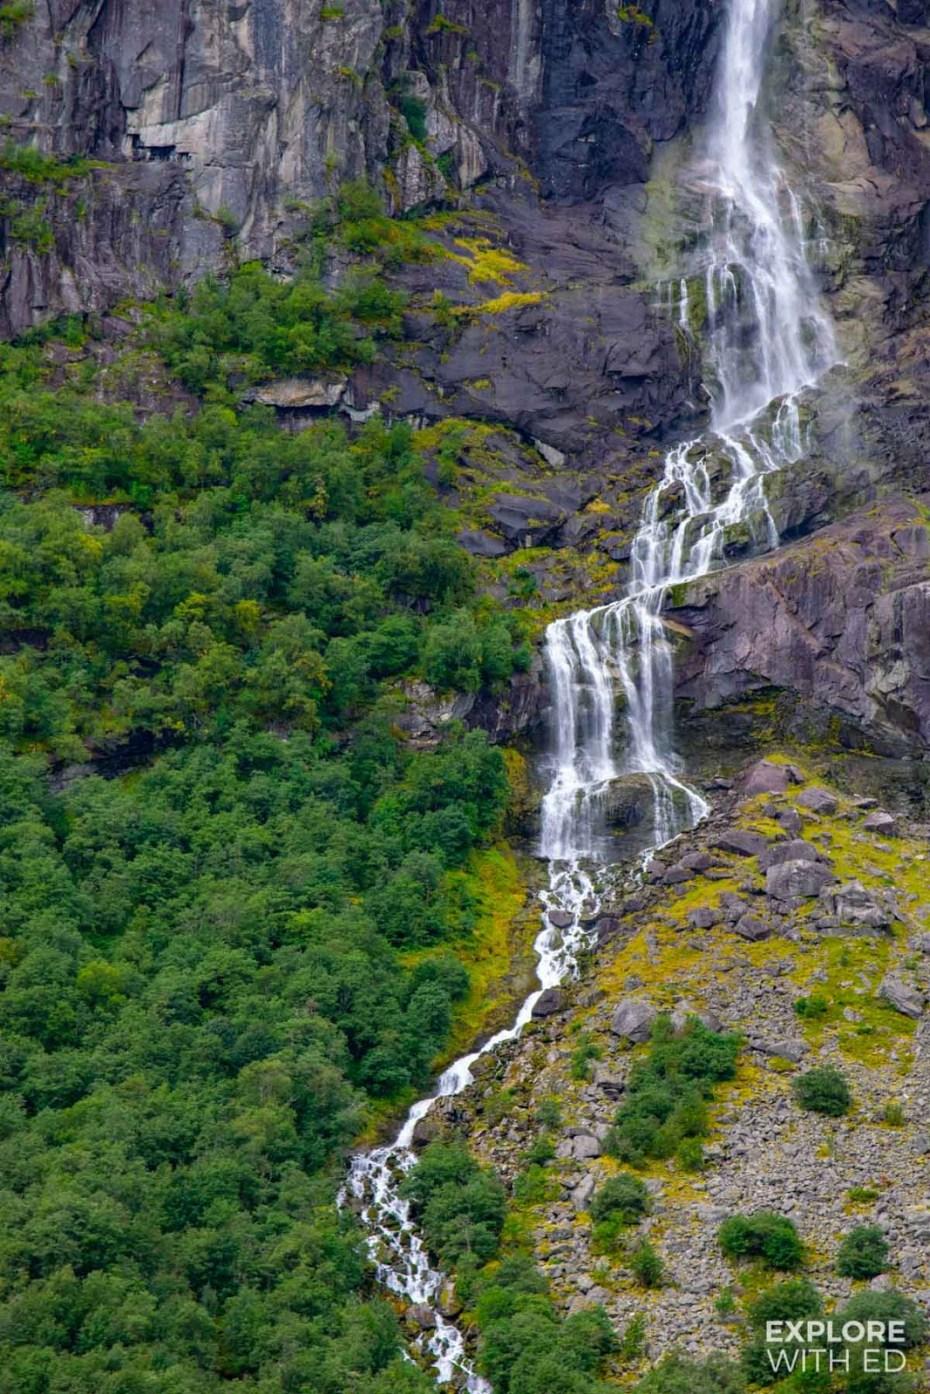 Spectacular waterfall in Jostedalsbreen National Park near Briksdal